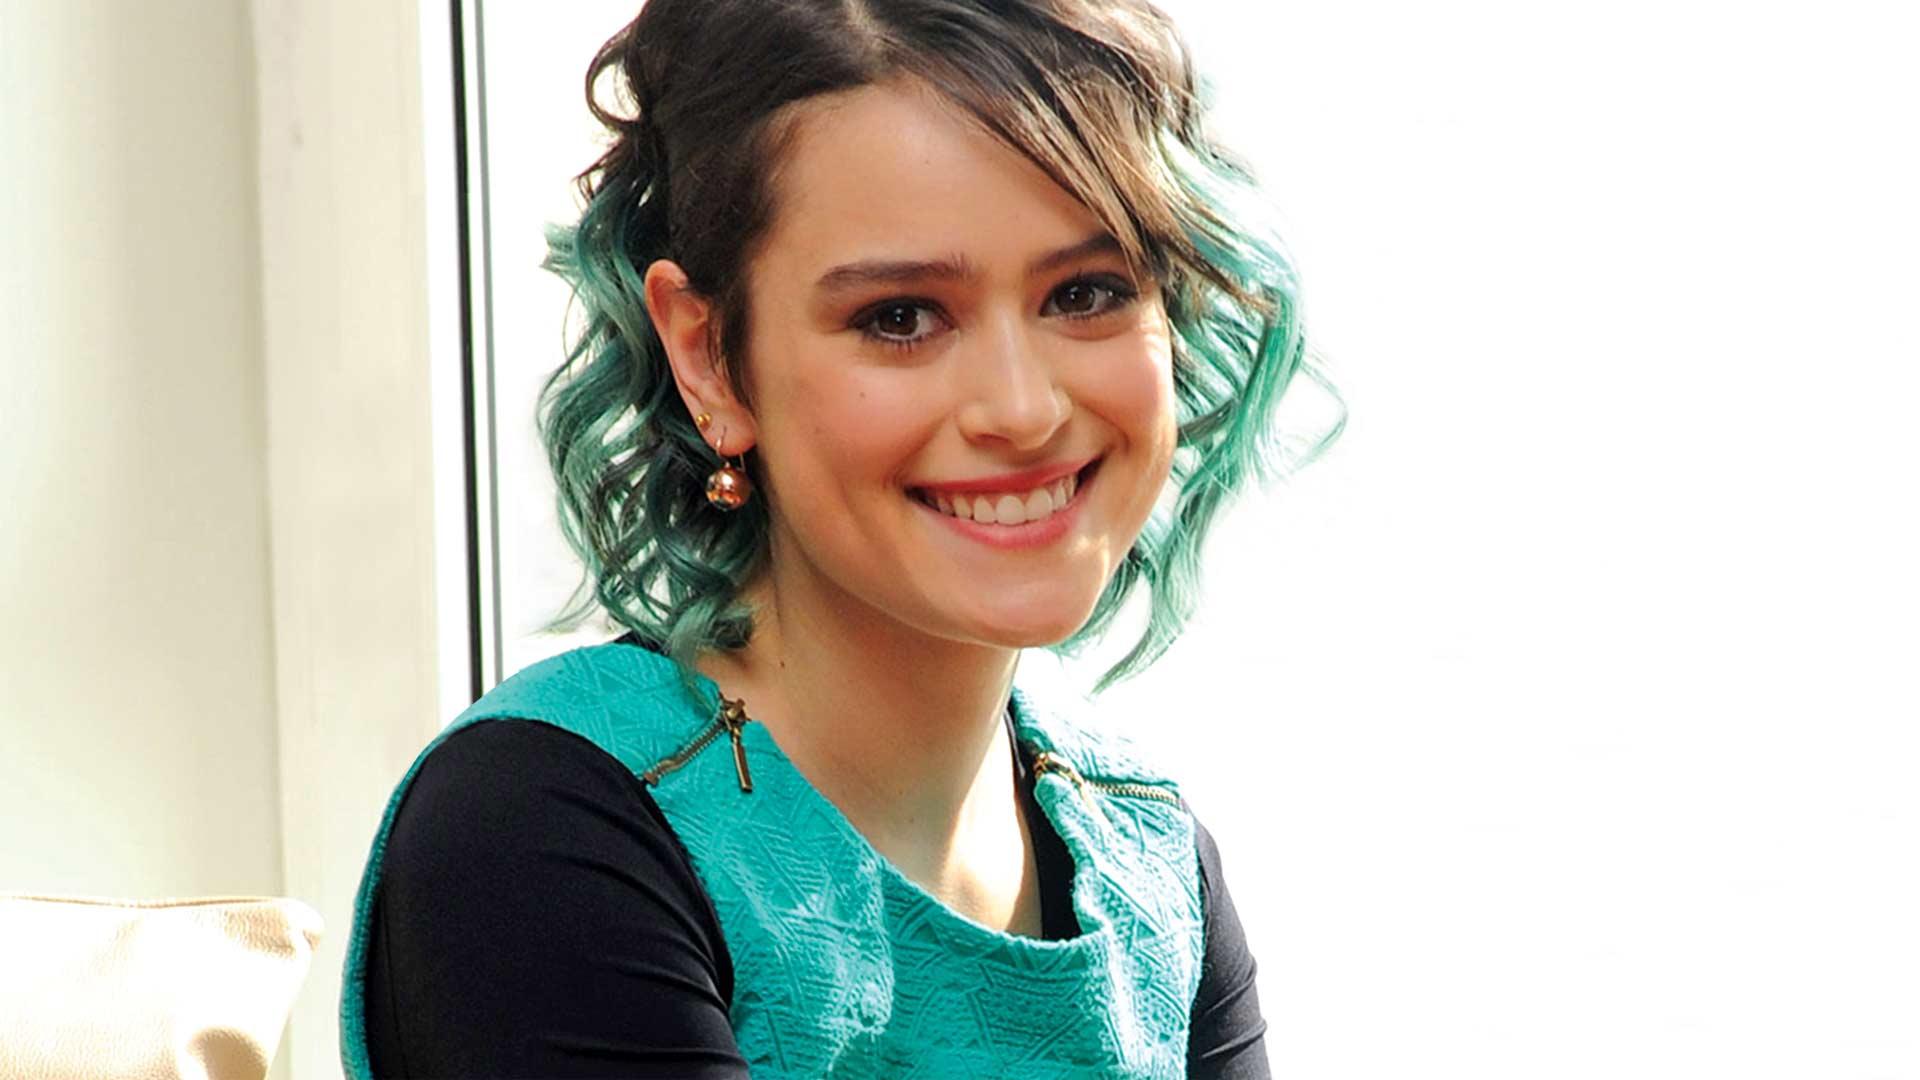 Rosabell Laurenti Sellers American, Italian Actress